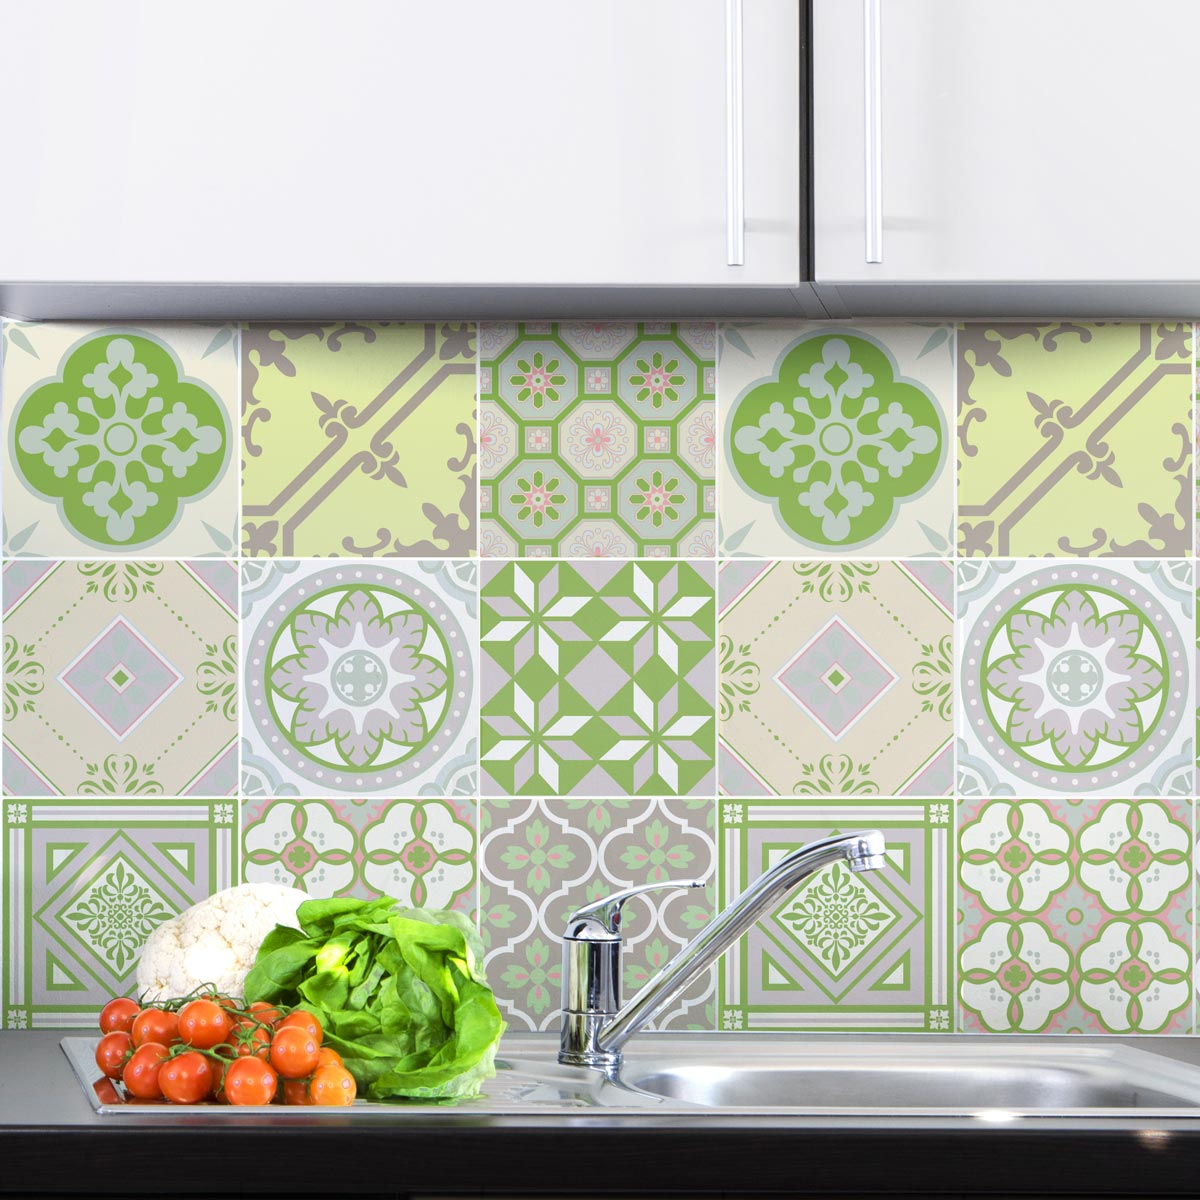 9 stickers carrelages azulejos nuance de vert art et design artistiques ambiance sticker. Black Bedroom Furniture Sets. Home Design Ideas